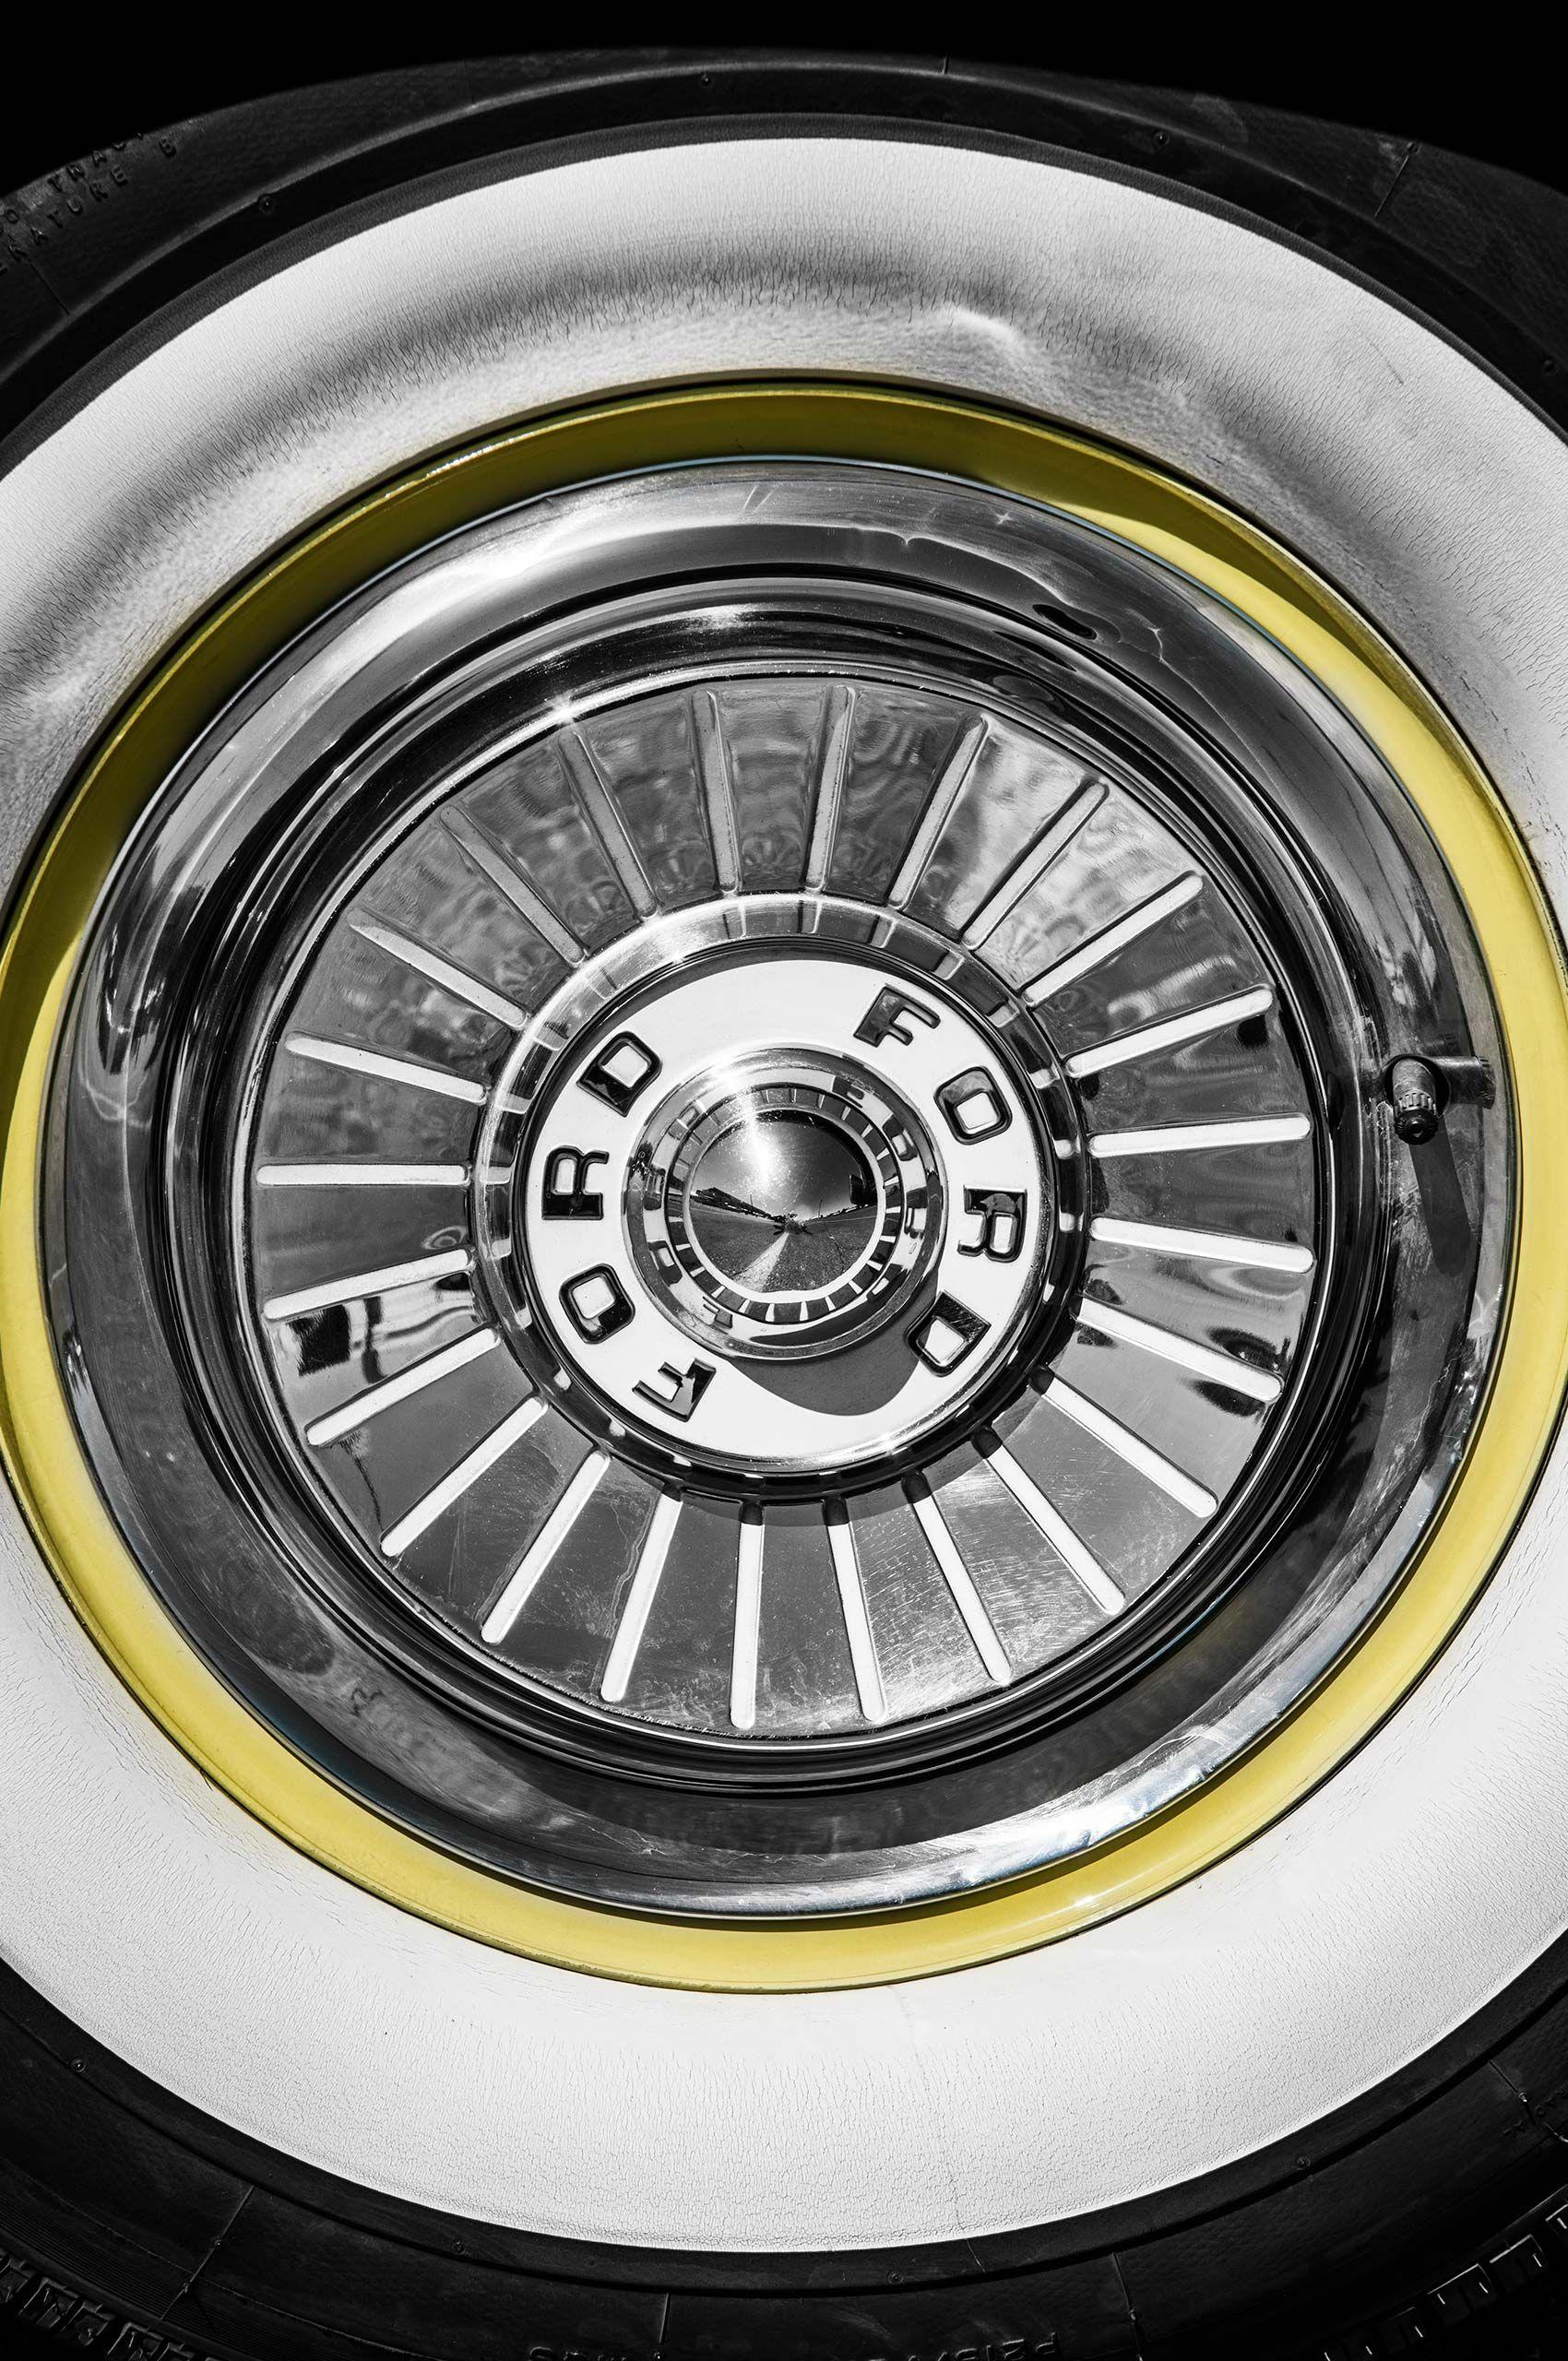 classic-wheel-vivalasvegas-HenrikOlundPhotography.jpg